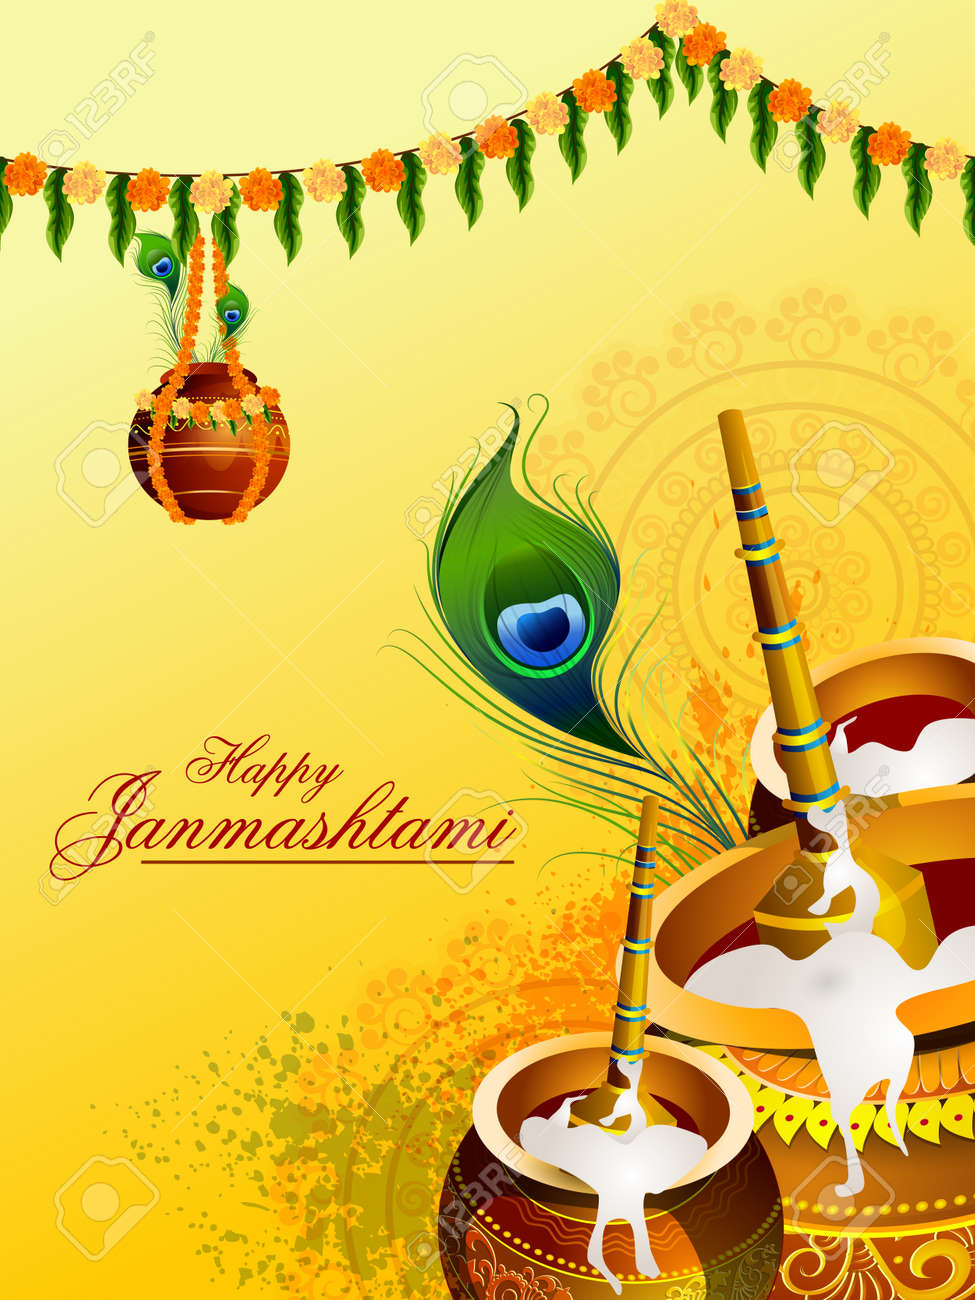 Happy Krishna Janmashtami Greeting Background Royalty Free Cliparts Vectors And Stock Illustration Image 83176413